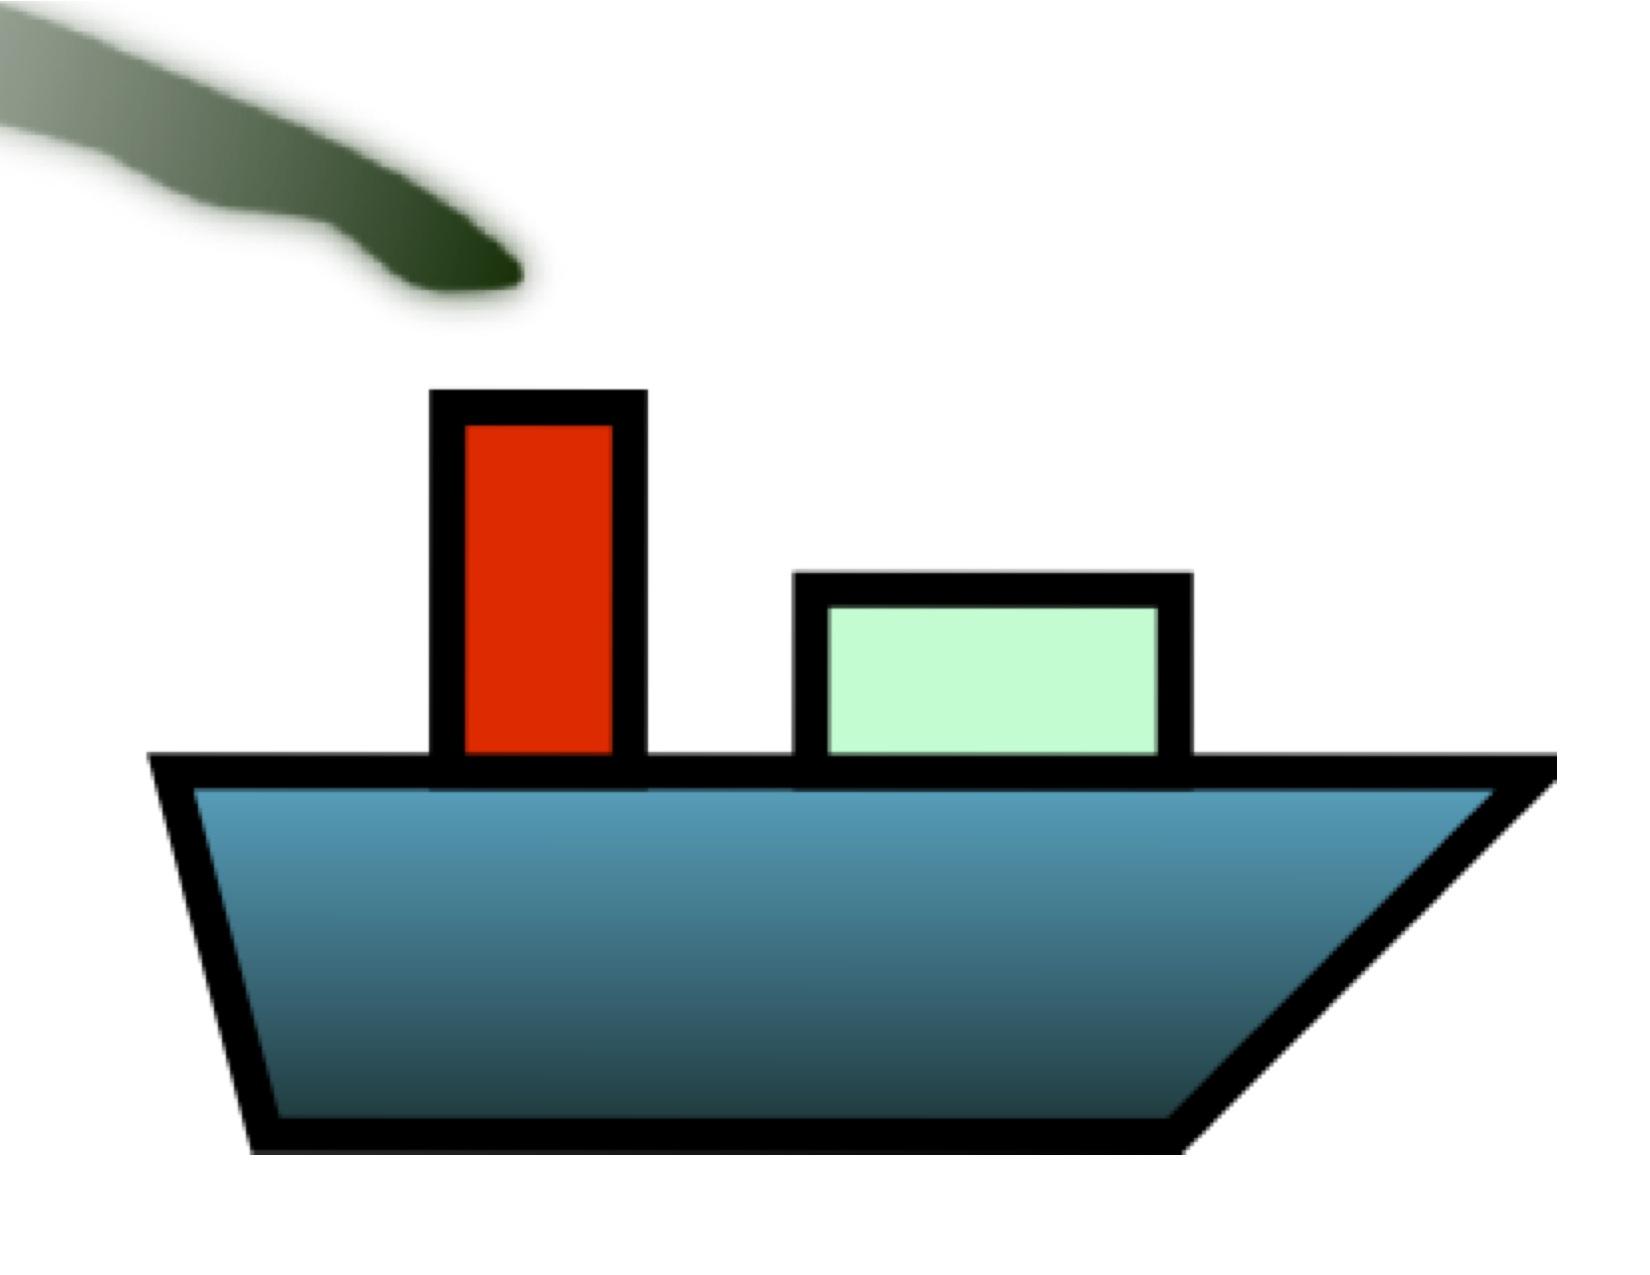 Cargo Ship Clipart - Clipart Kid